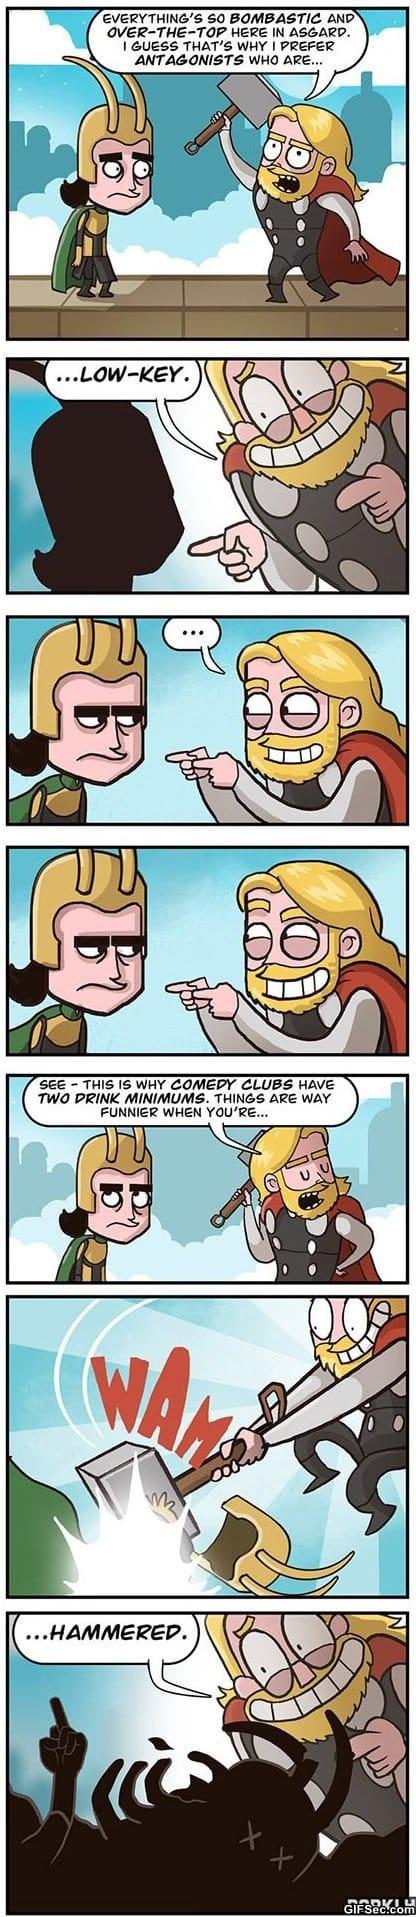 funny-thor-and-loki